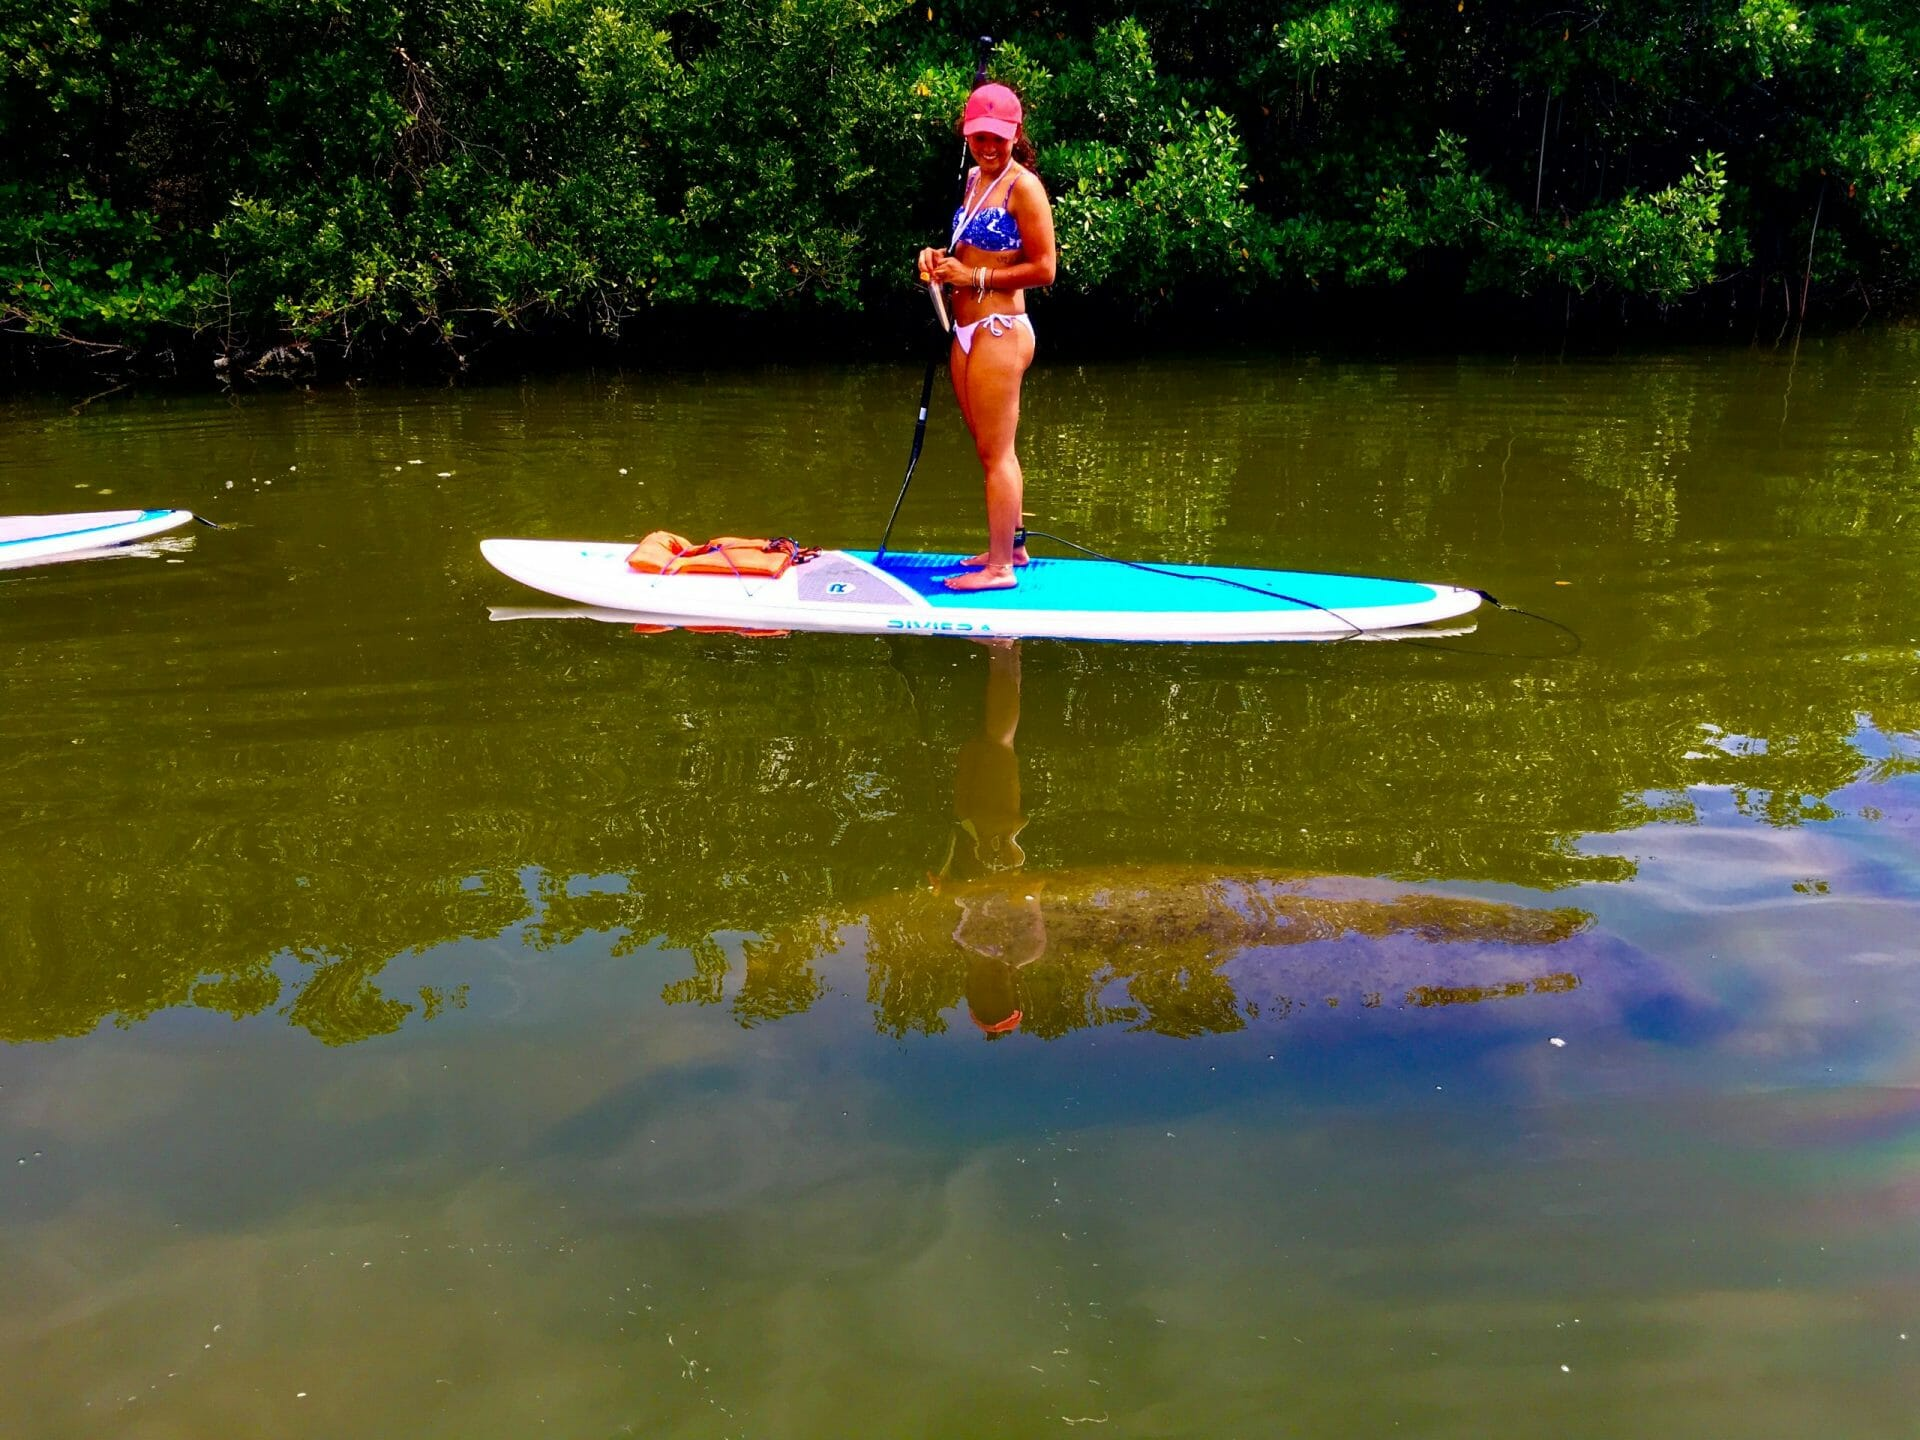 SOBE SURF MANATEE TOUR COCOA BEACH MERRITT ISLAND FLORIDA